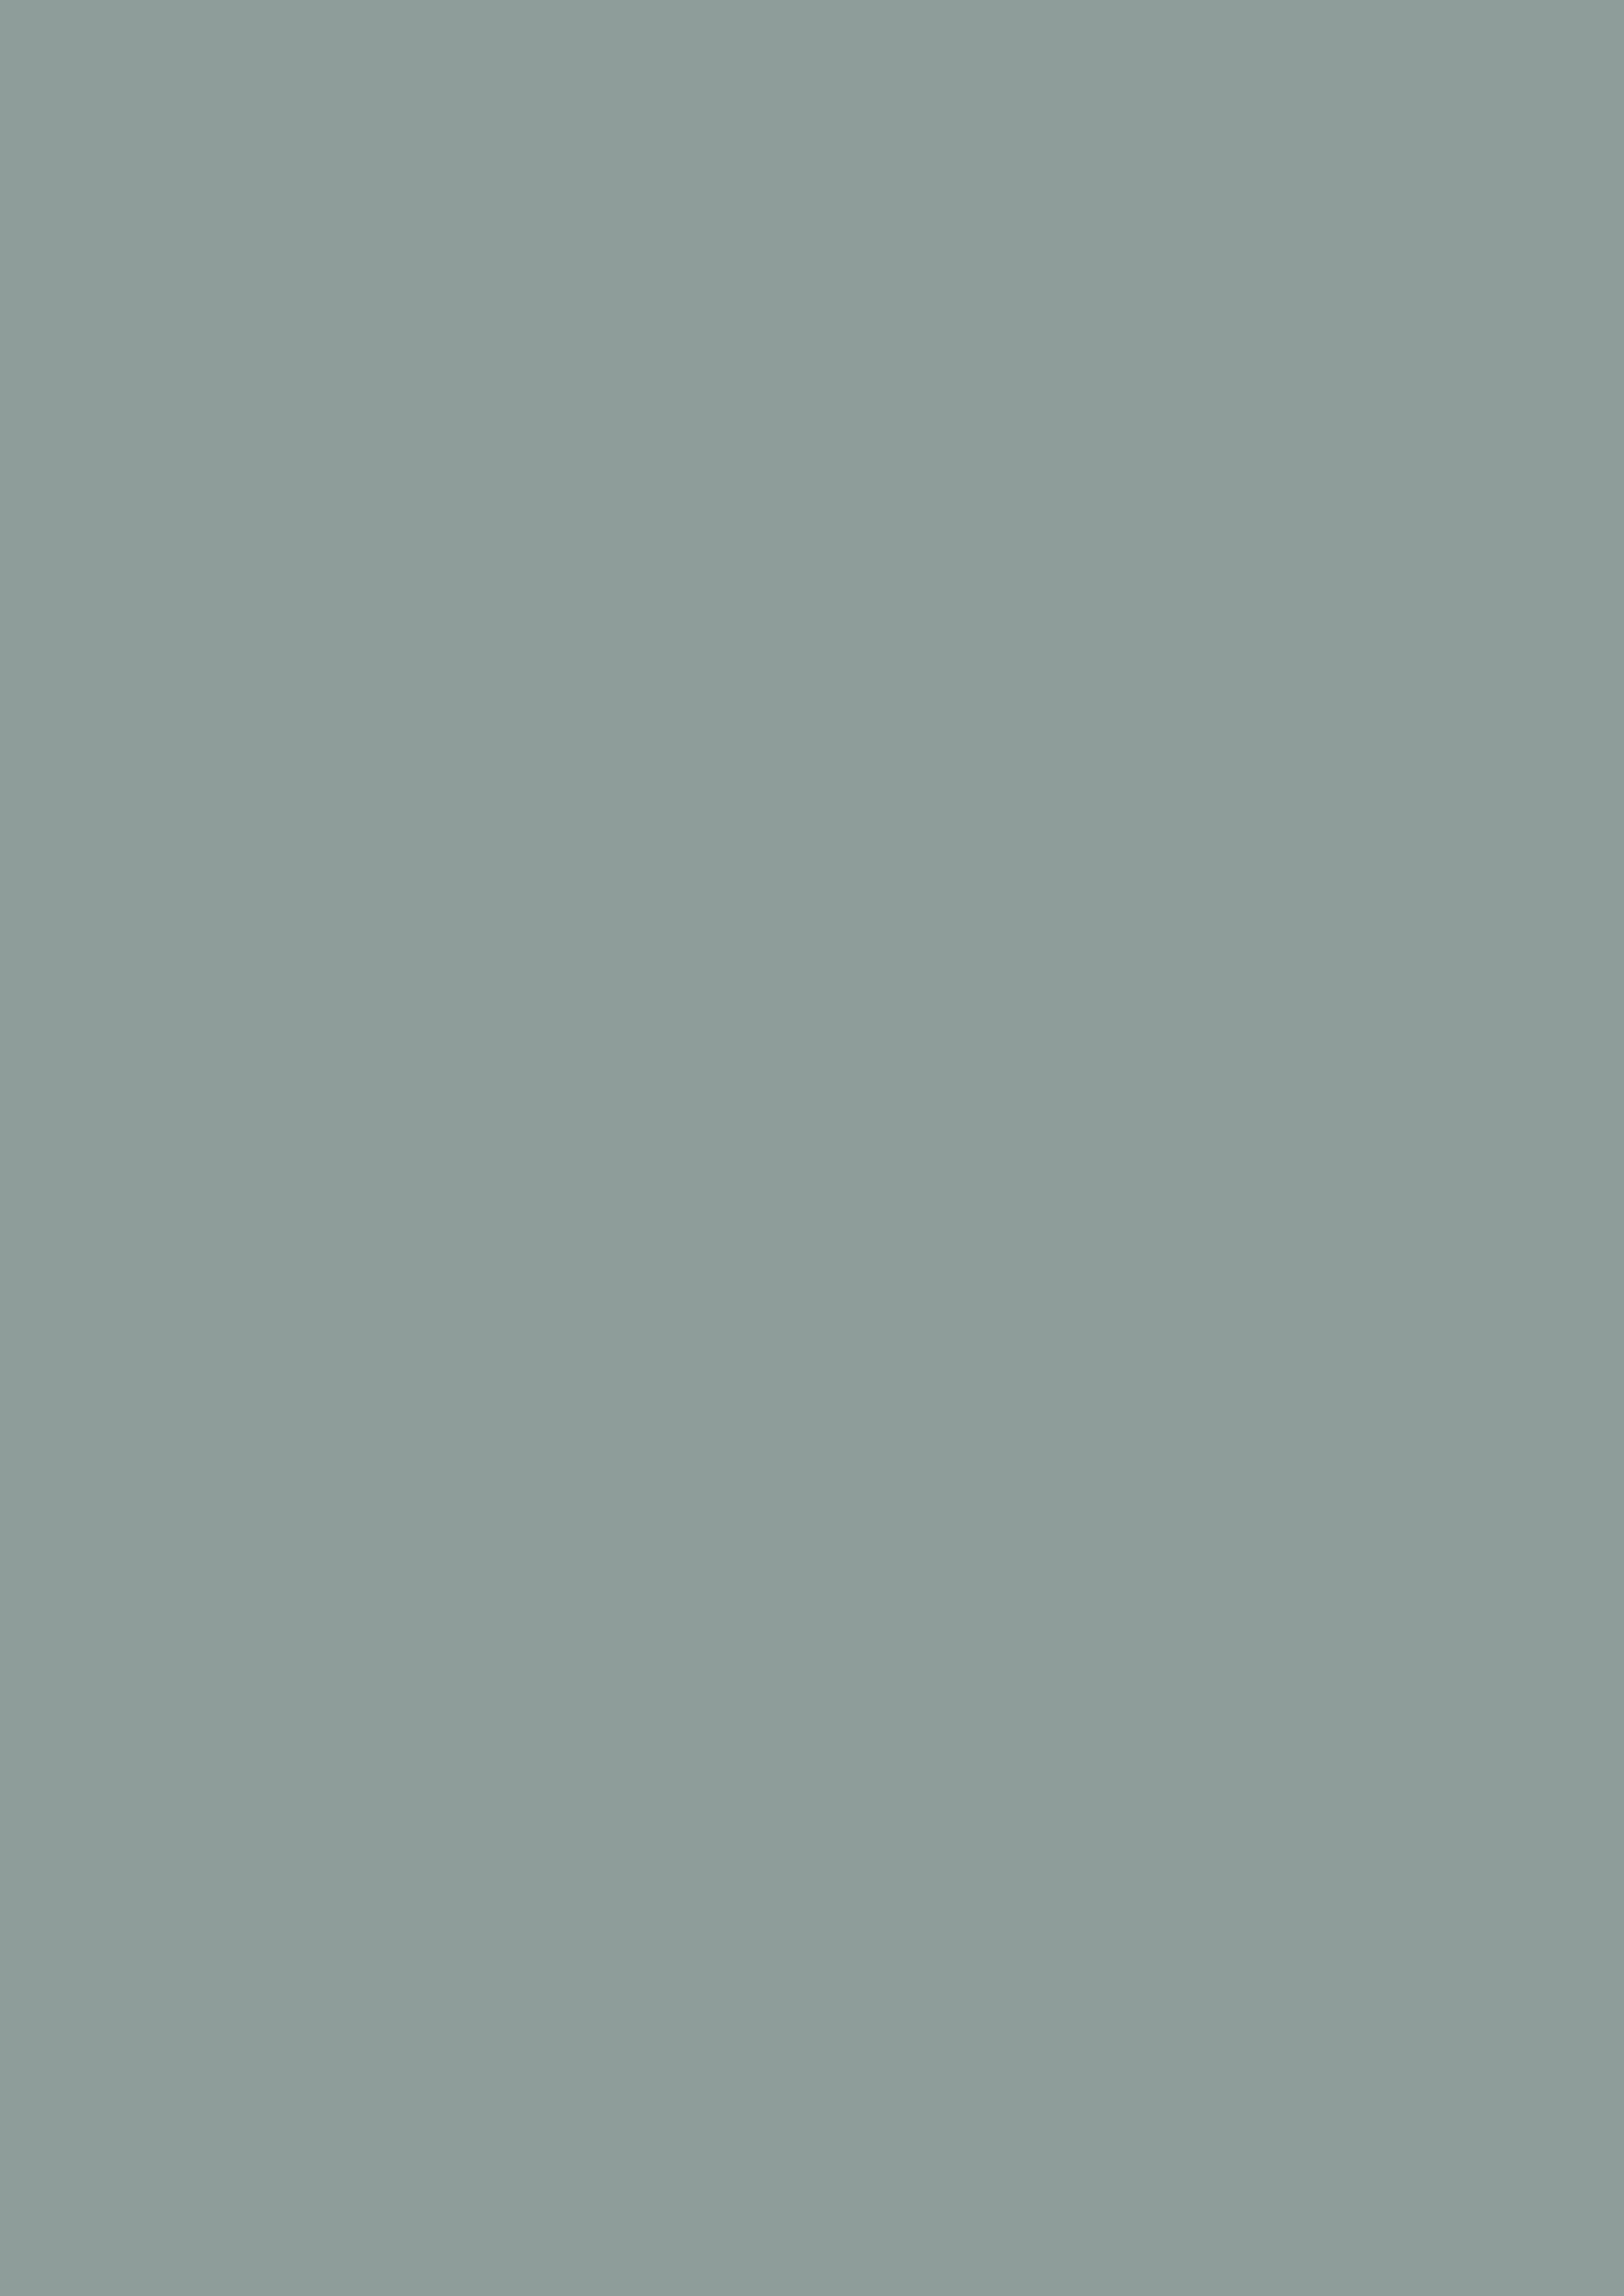 Fjord Grün Matt Vorschaubild